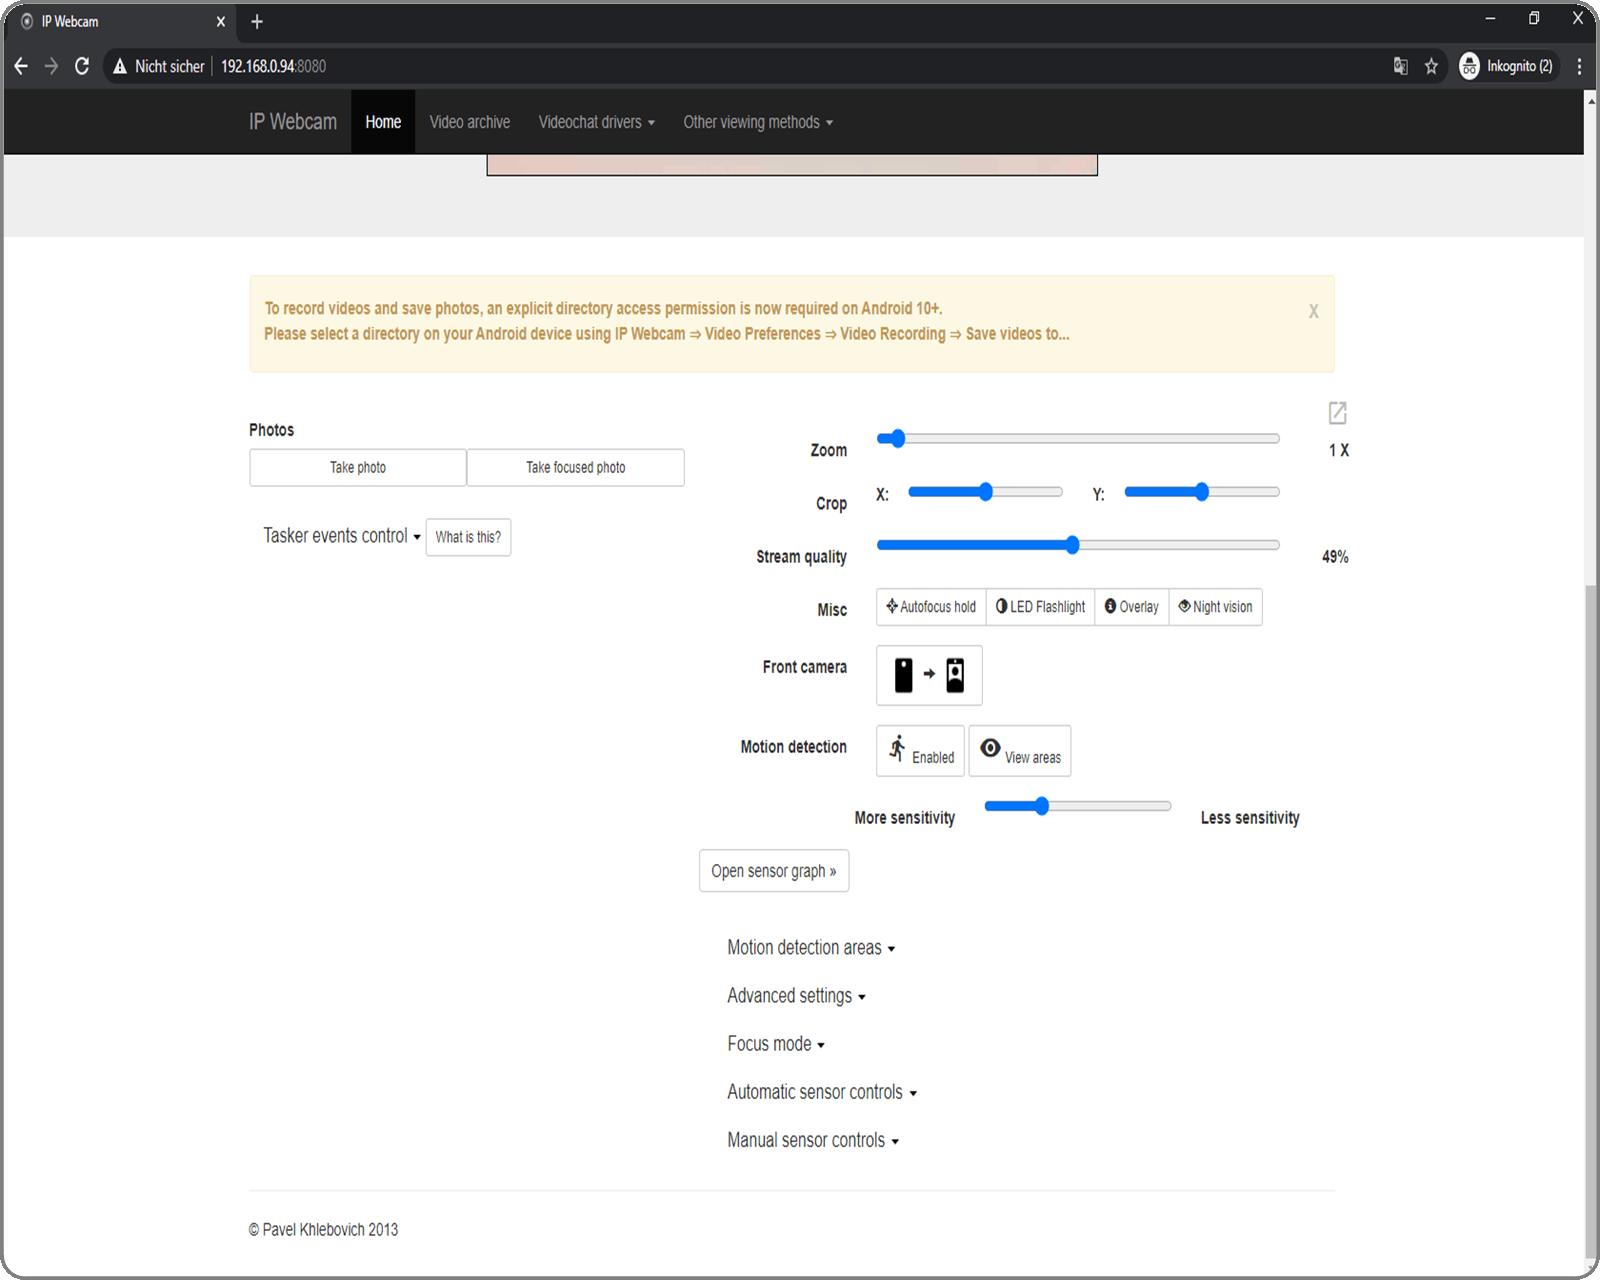 obs_13_ipwebcam_controlcenter_settings.png